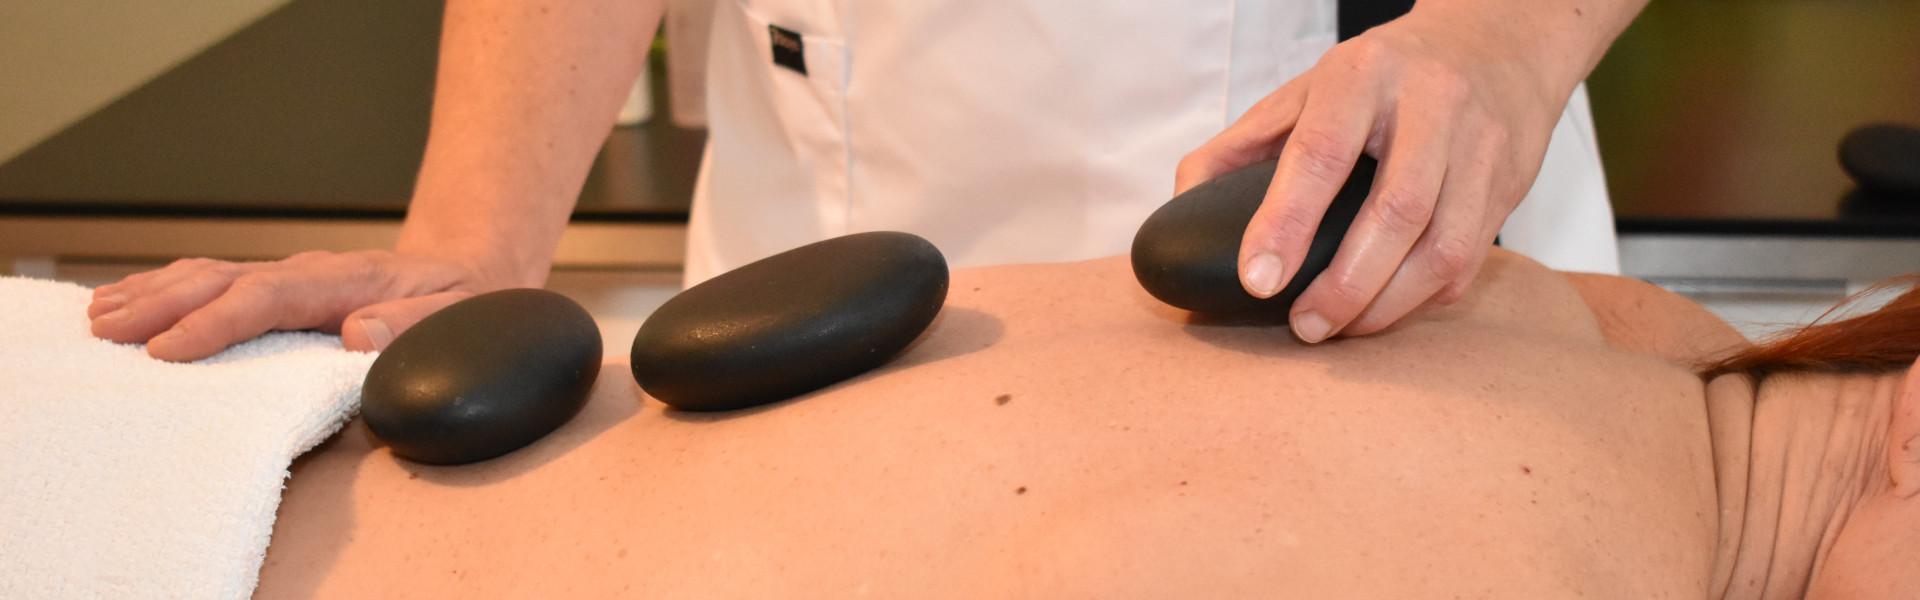 hotstone massage behandeling